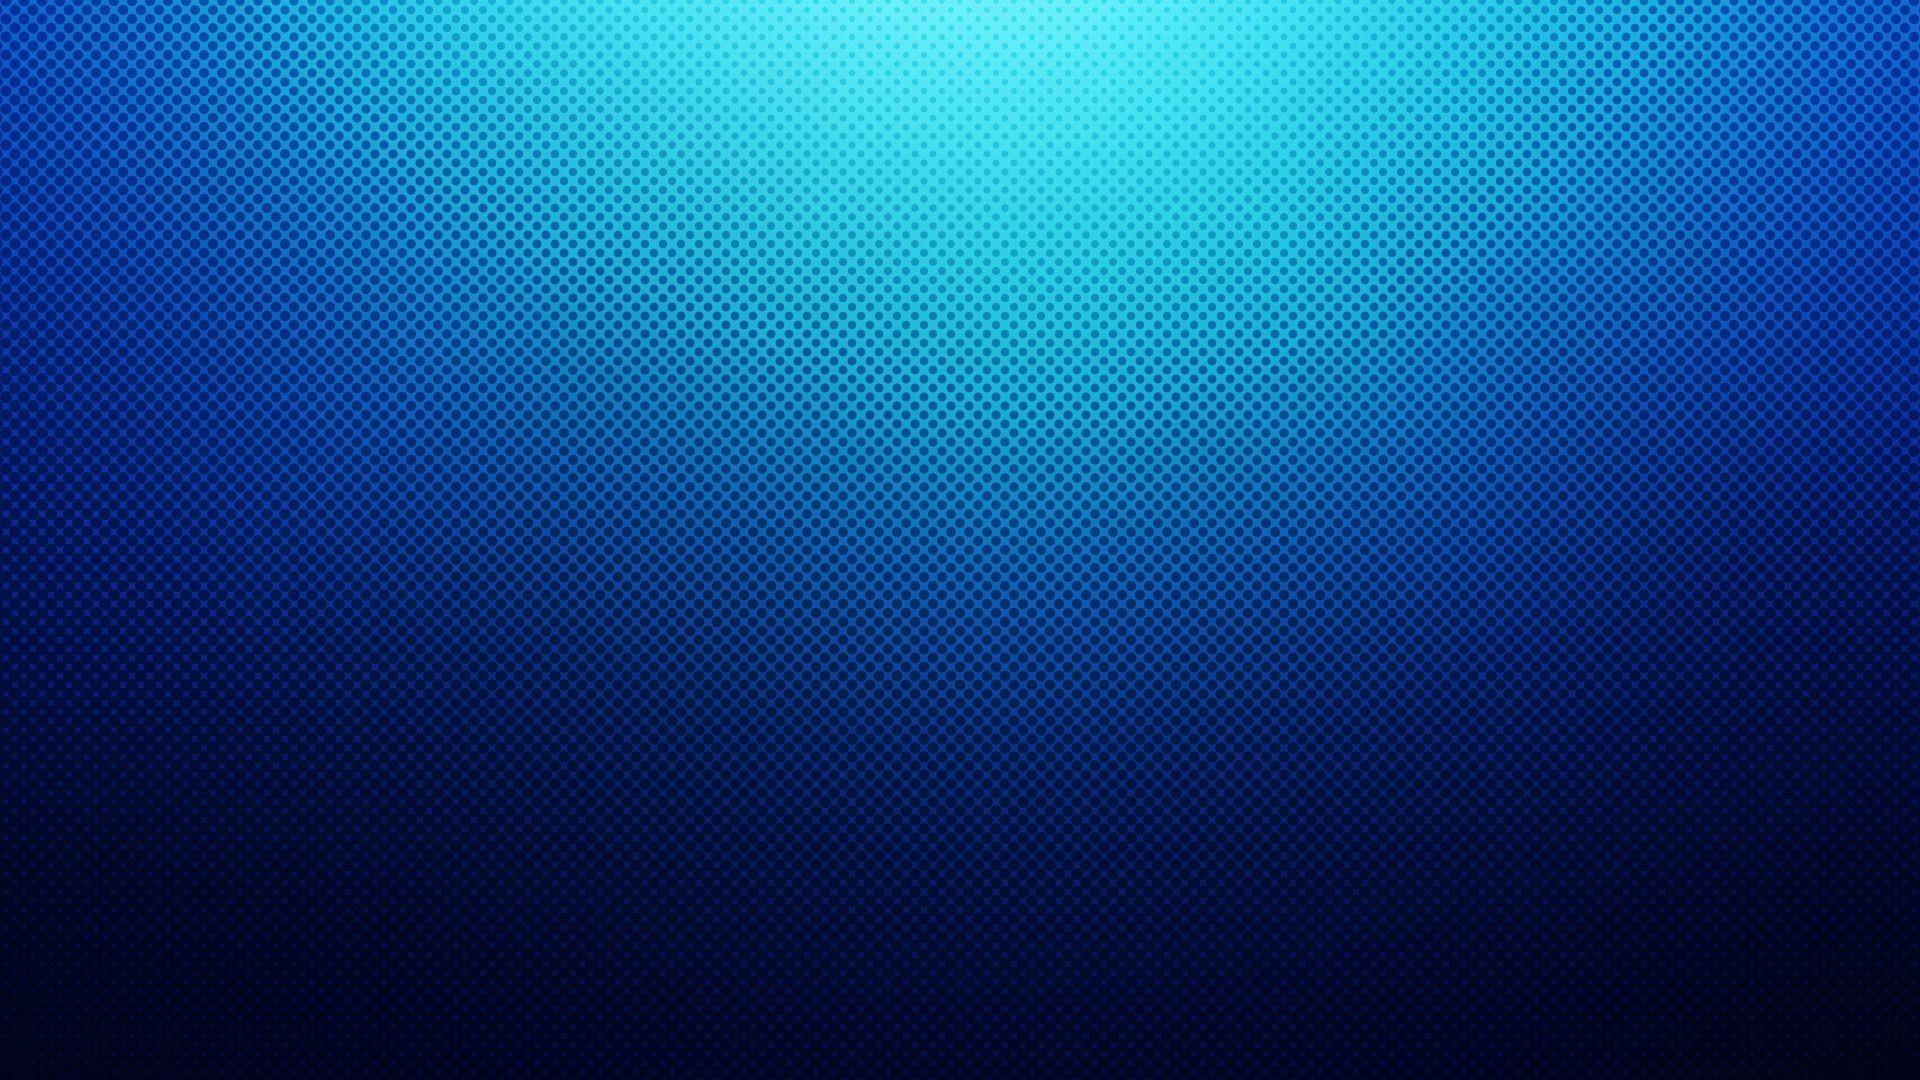 Blue dotted pattern HD Wallpaper 1920×1080